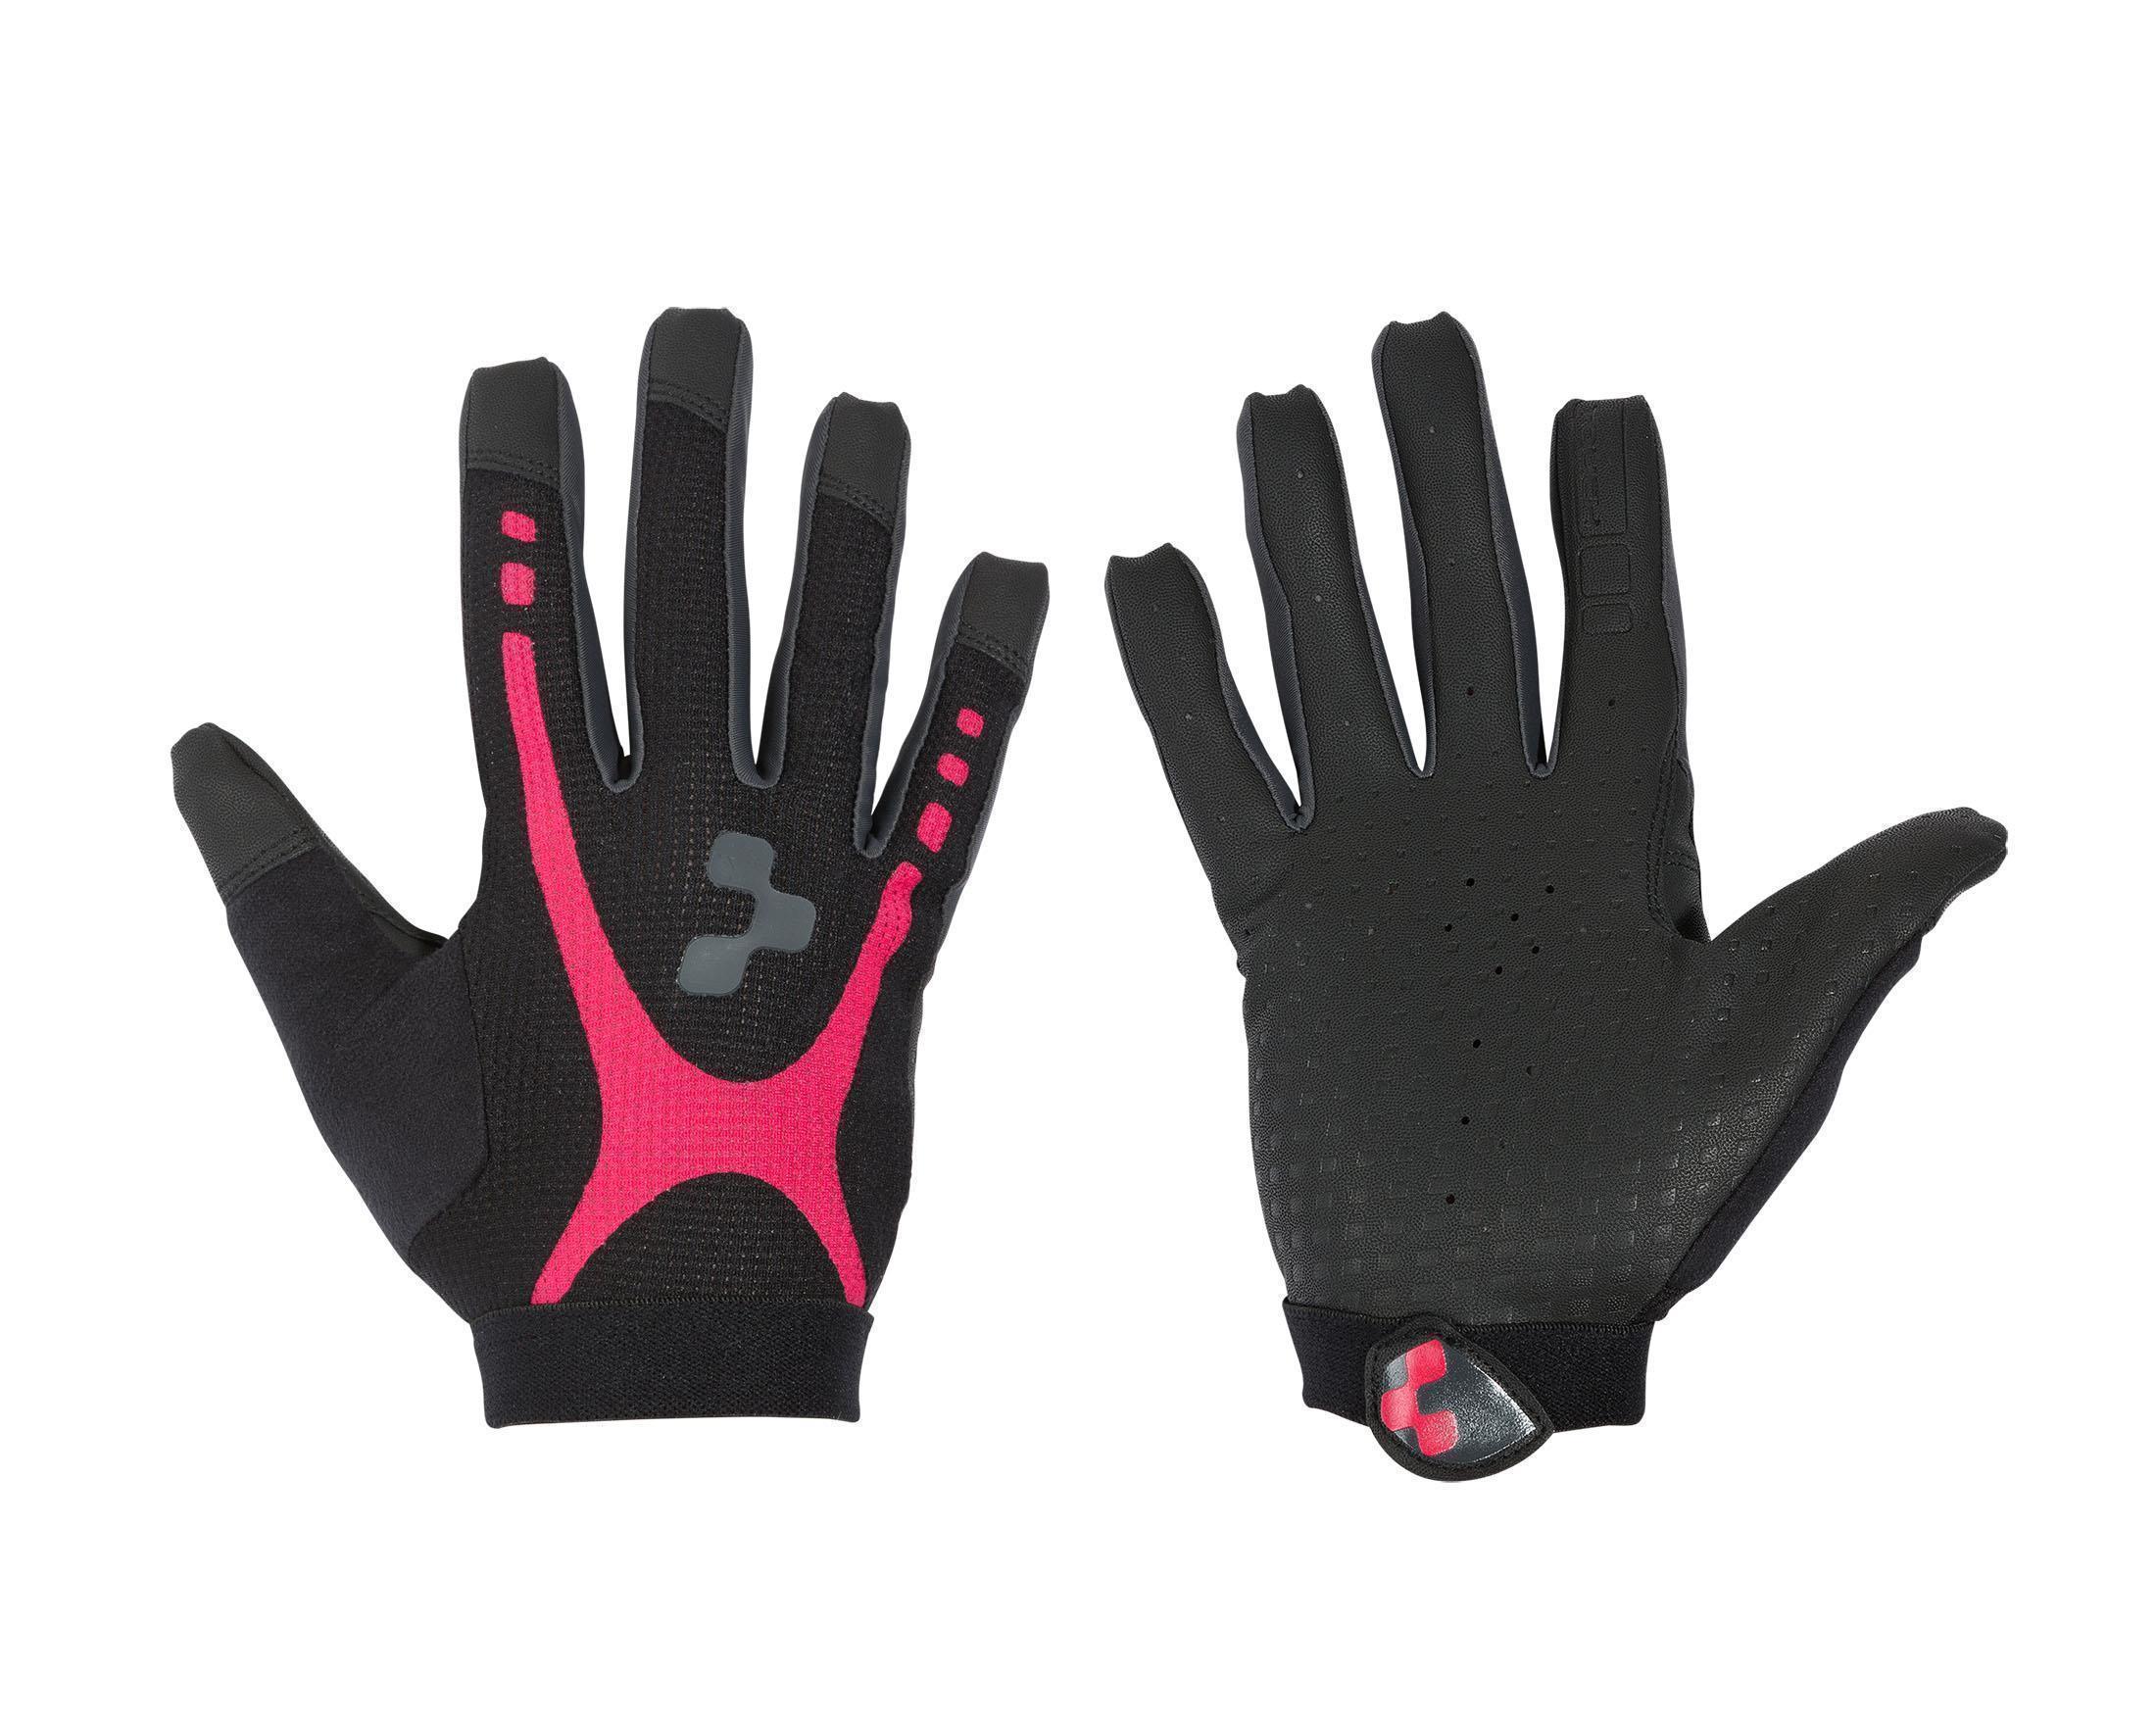 Cube Handschuhe | Fahrrad Gloves | Bike Bekleidung ...